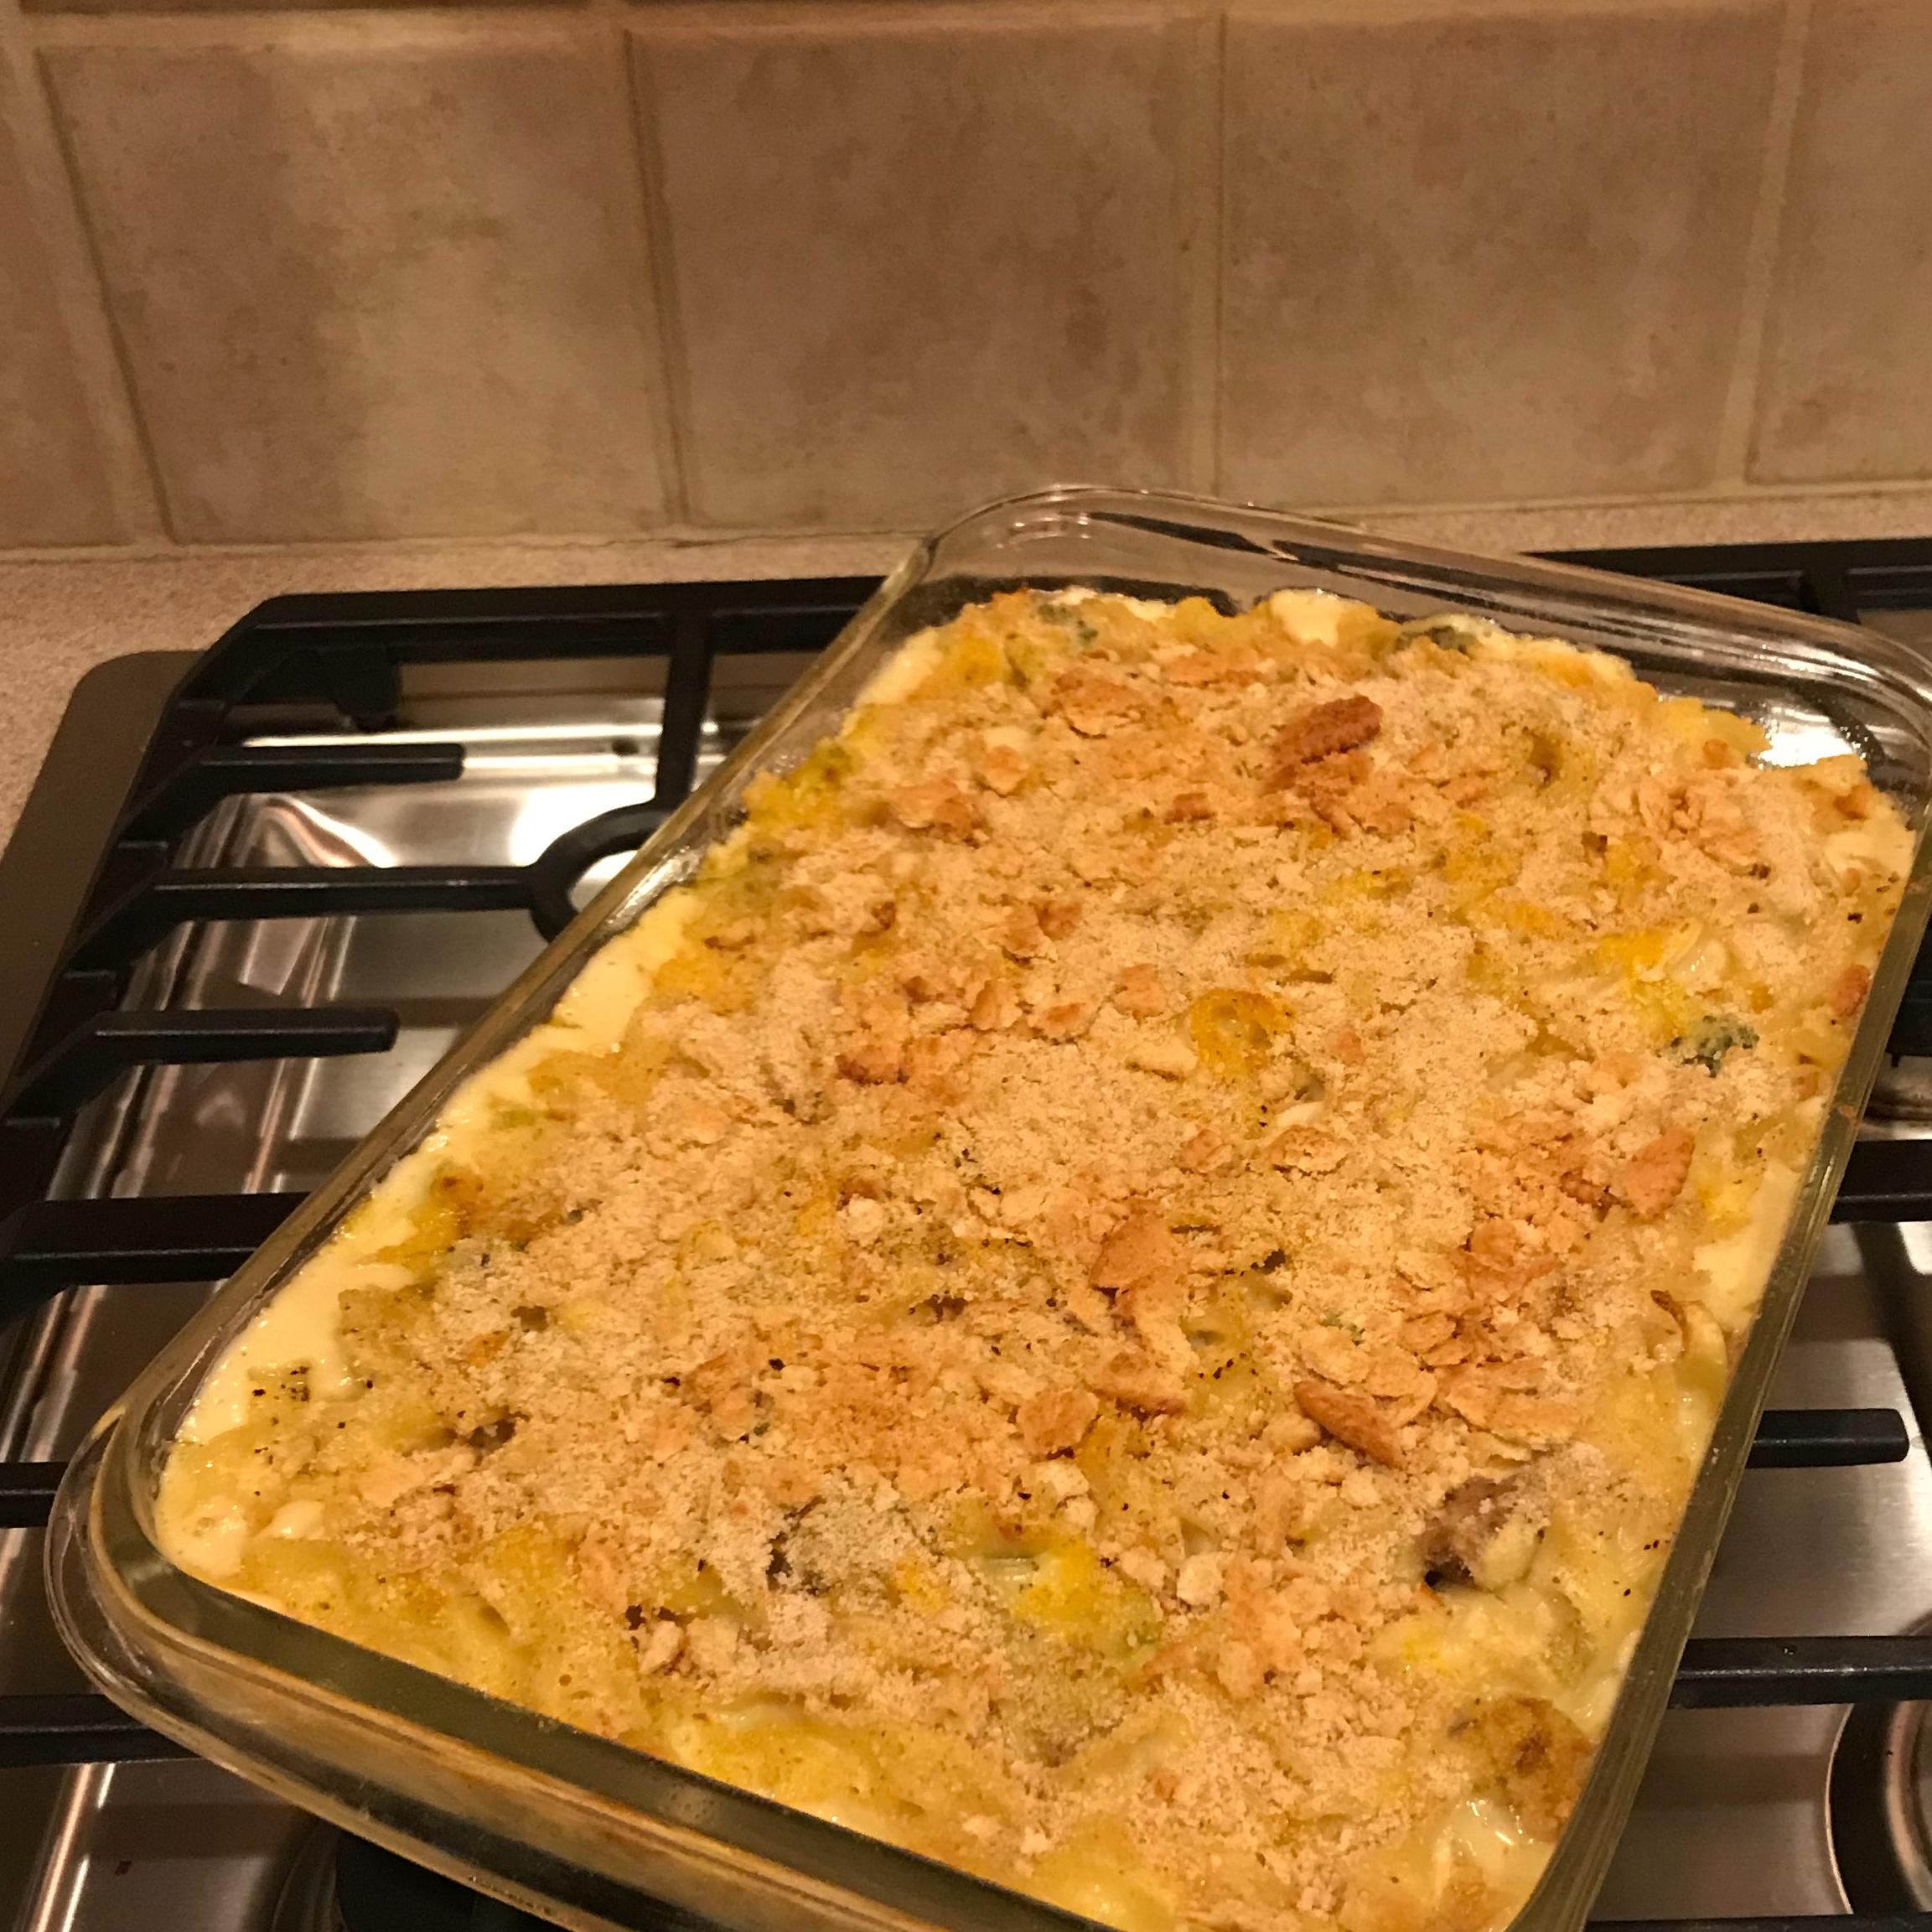 Wanda's Chicken Noodle Bake